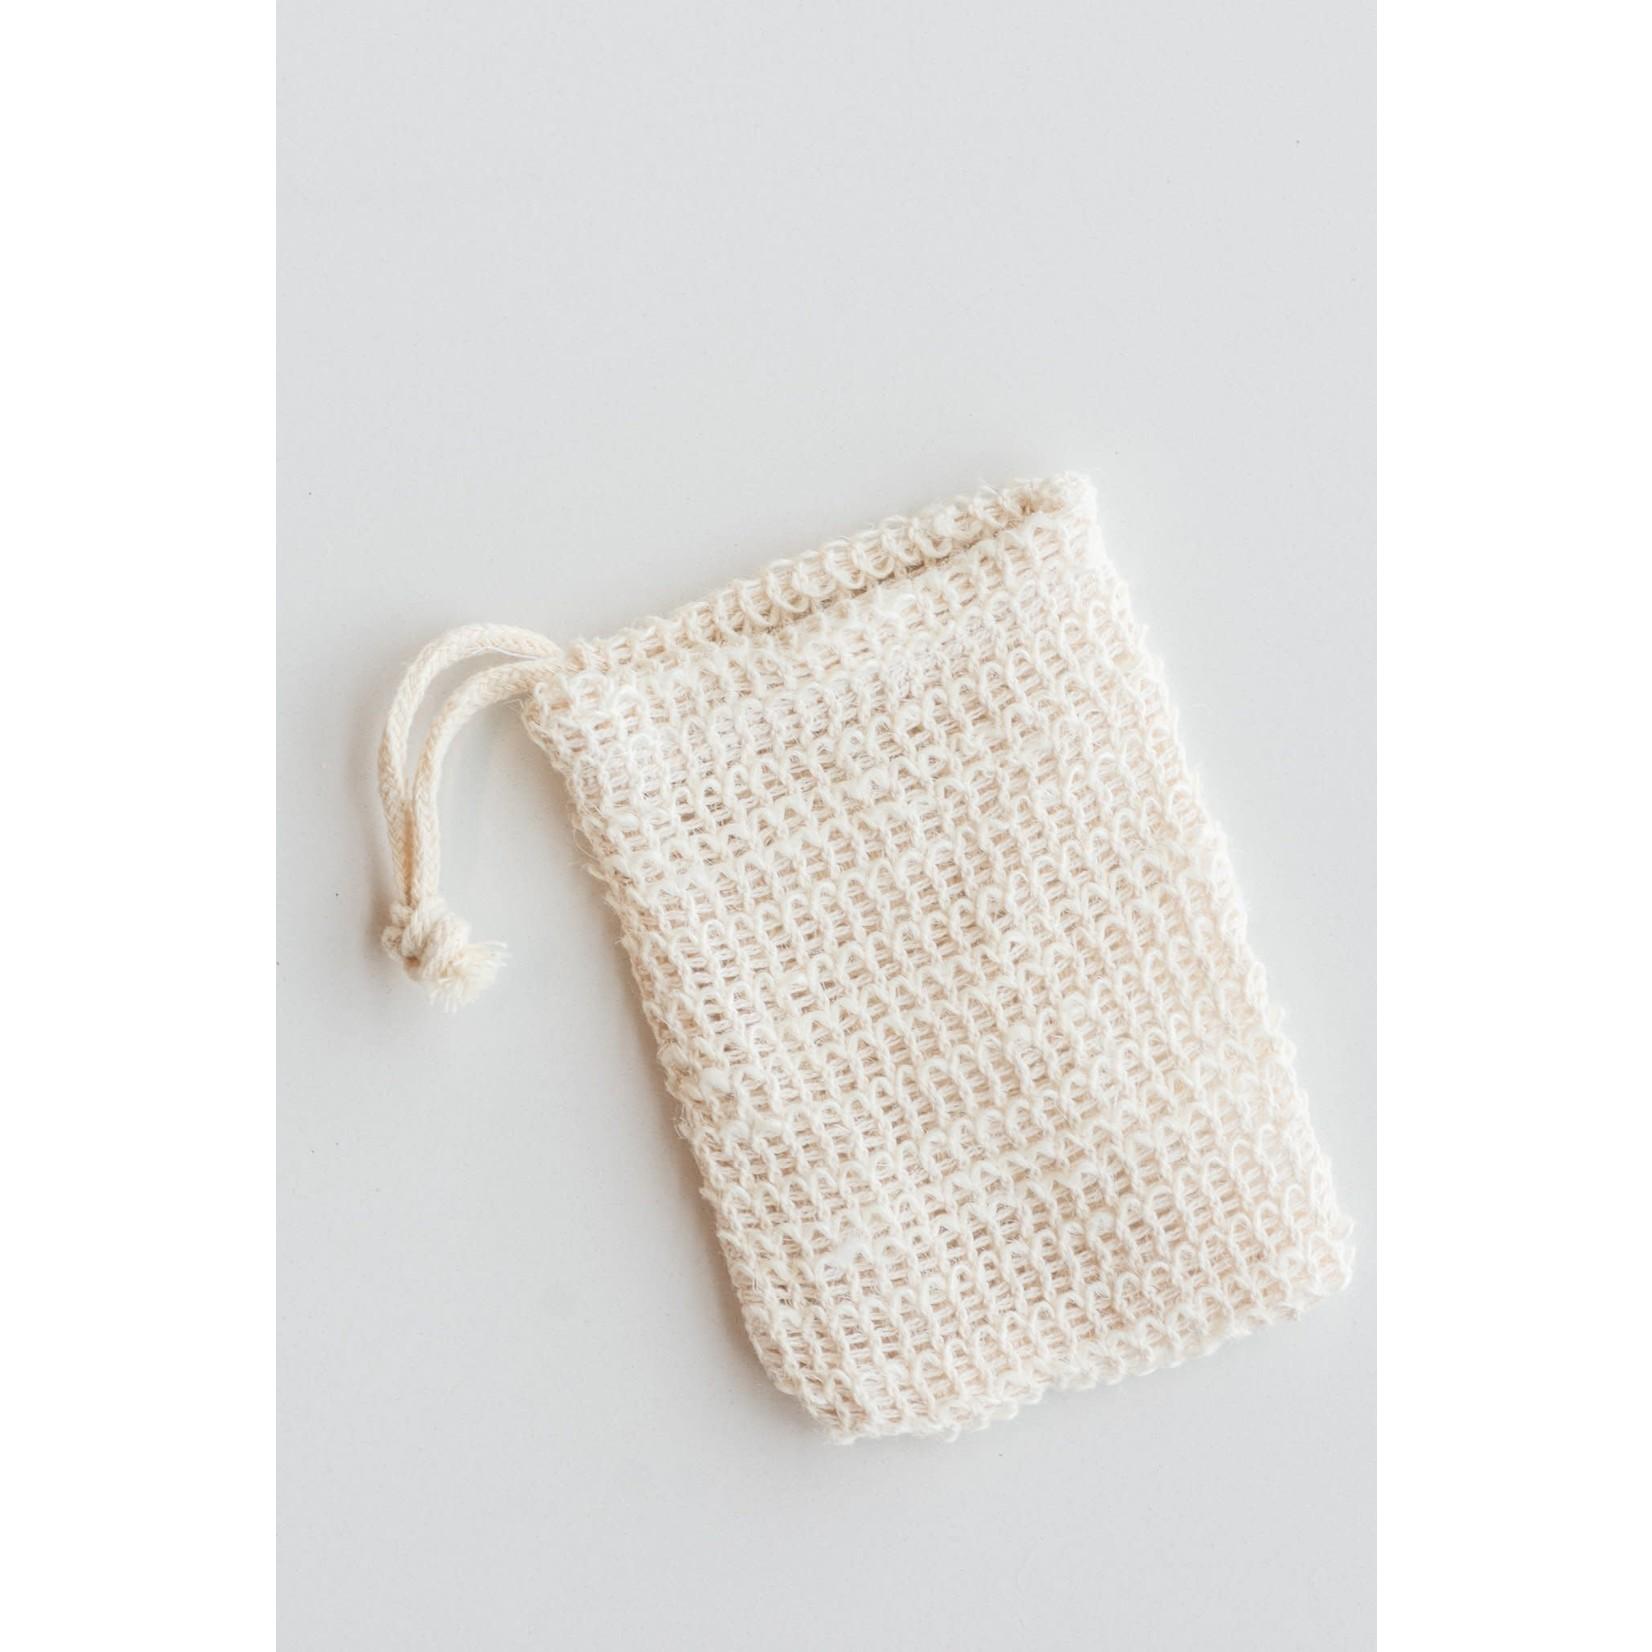 NO TOX LIFE CASA AGAVE™ WOVEN SOAP BAG